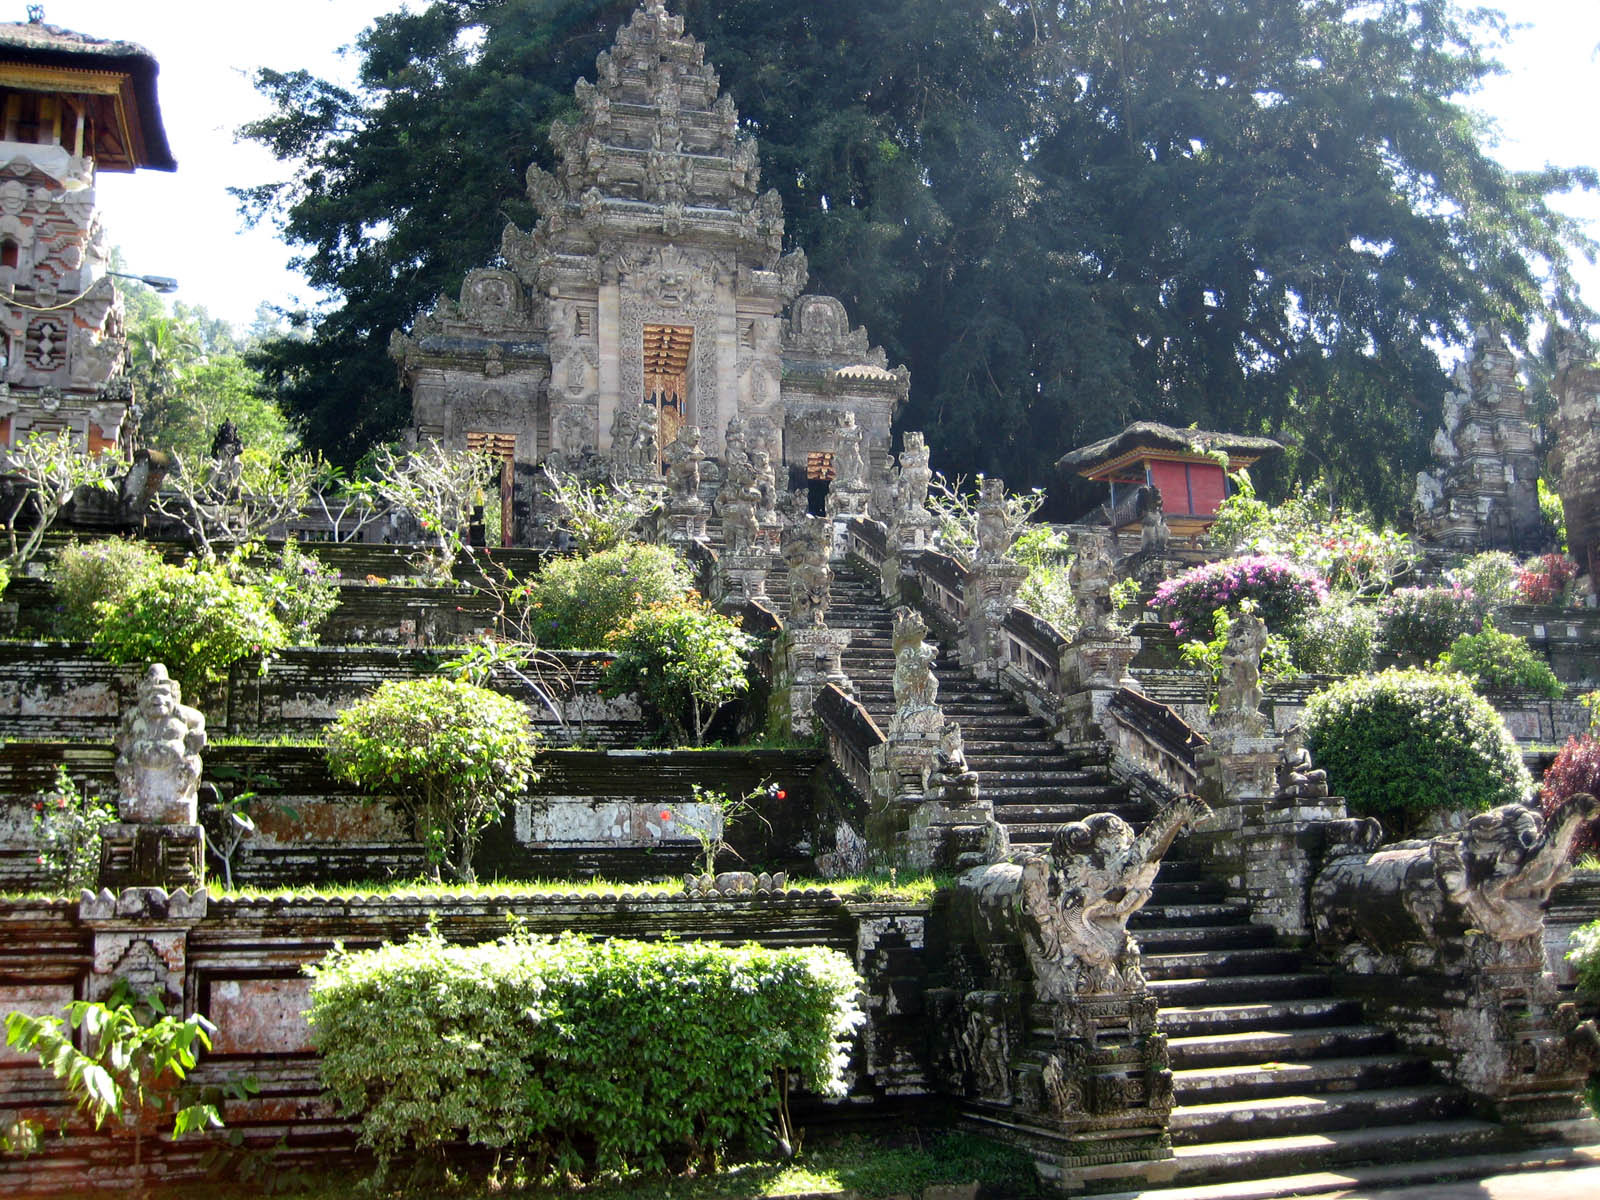 Photo via www.BaliTourismBoard.org